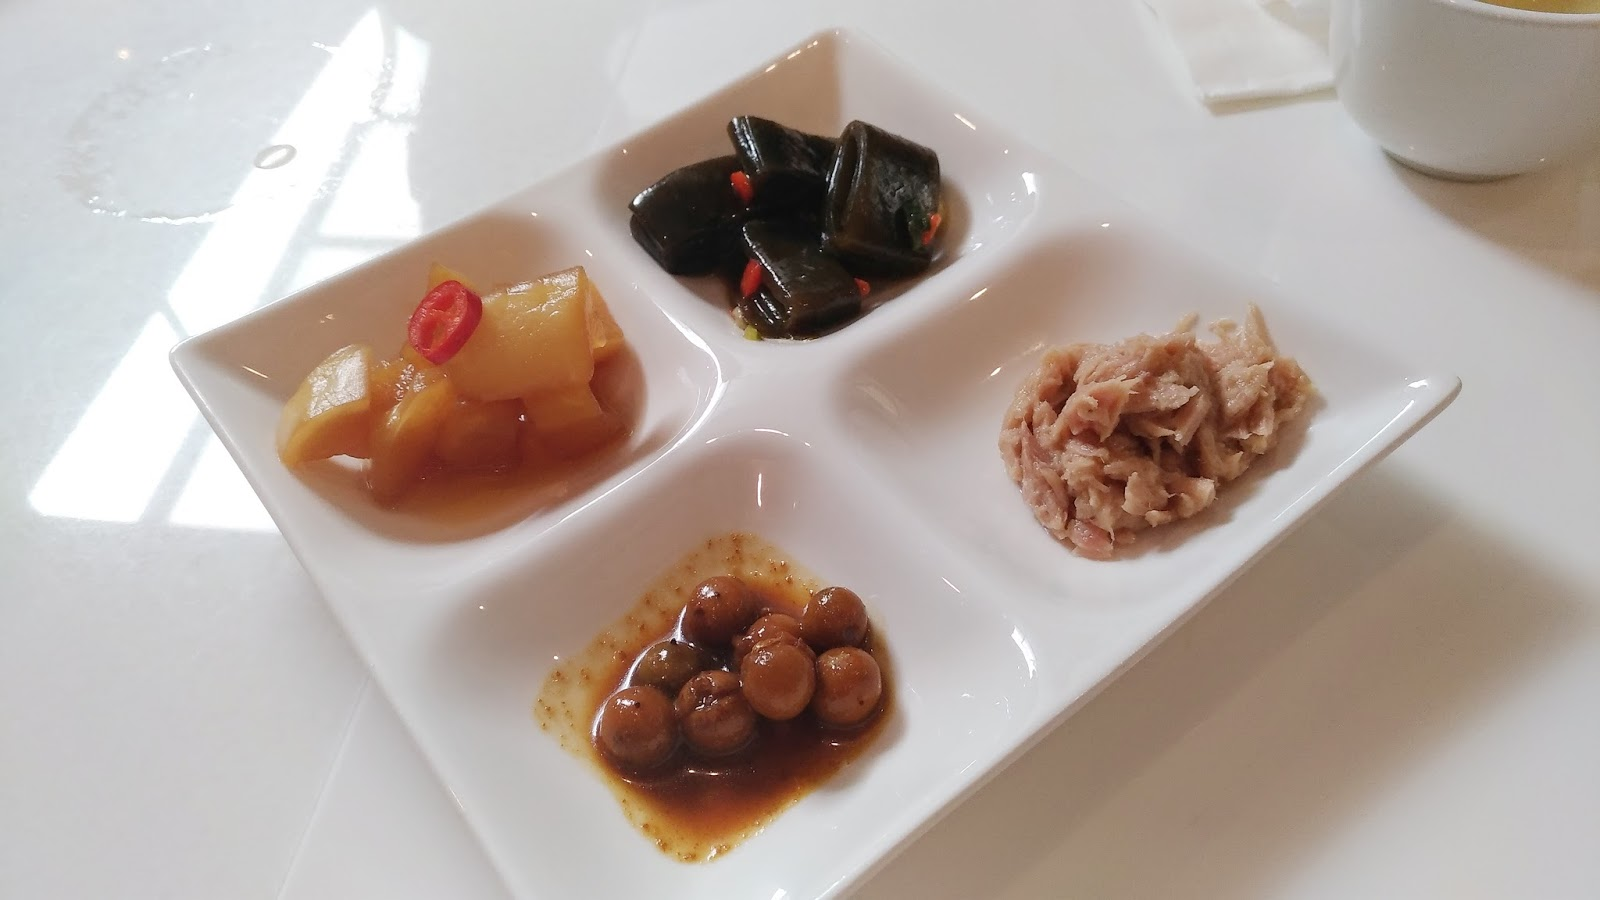 P 20170712 133315 vHDR Auto1 - 【嘉義美食】皇爵大飯店-優雅平價的豪華套餐,就在火車站旁!